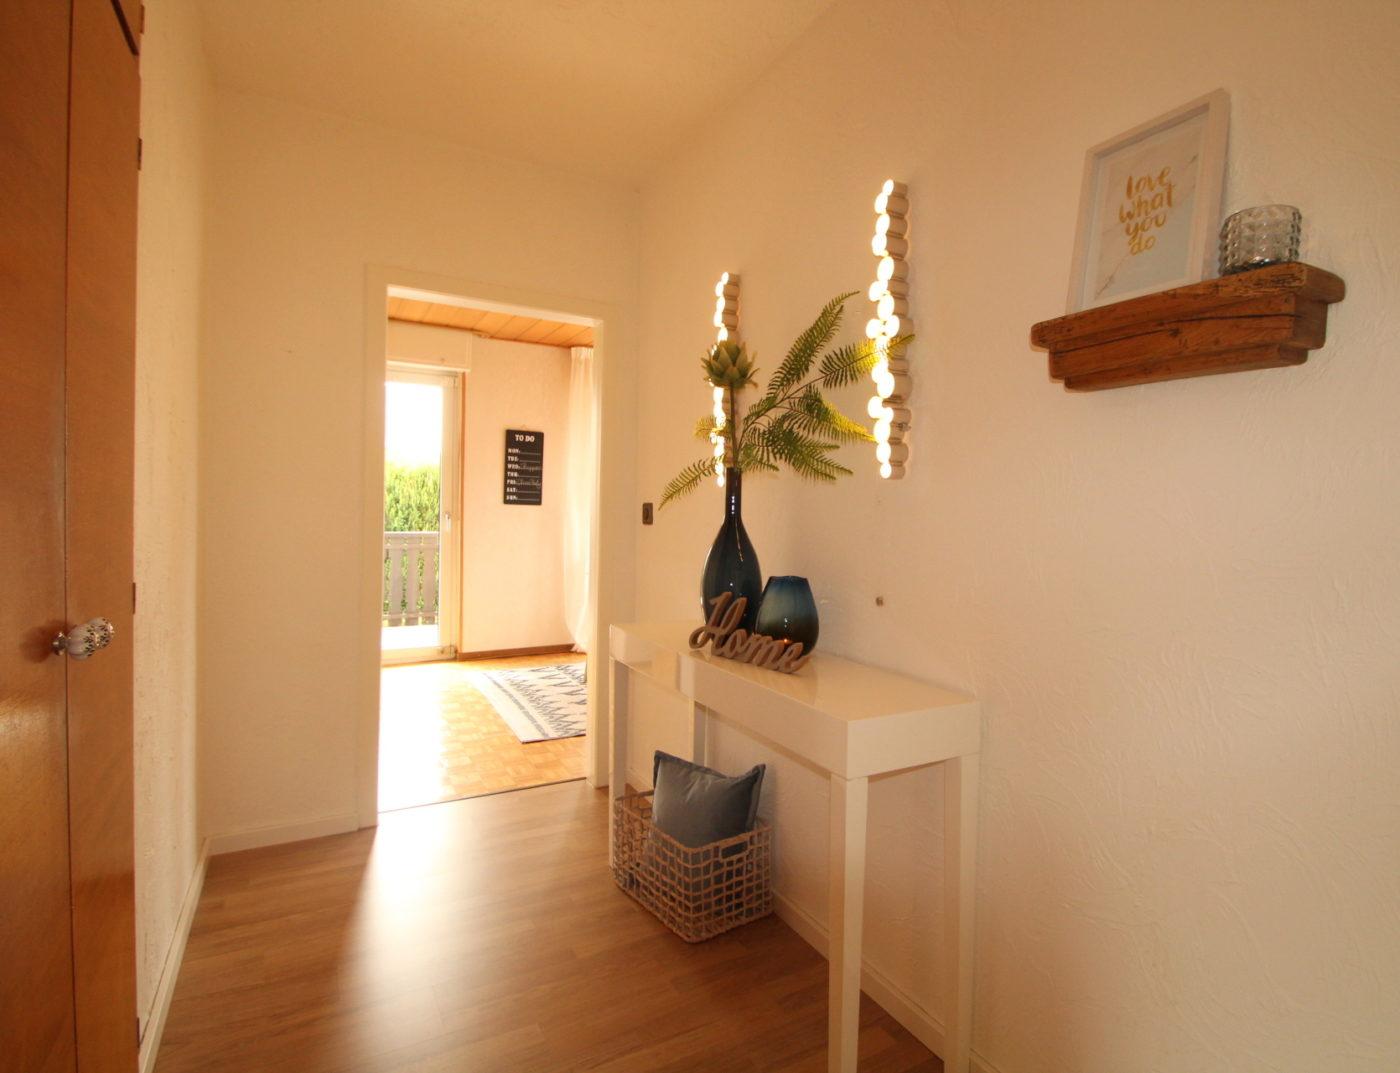 Stimmungsvolle Kaufatmosphäre schaffen mit Blickfang Homestaging aus Soest. So verkauft man Immobilien heute!